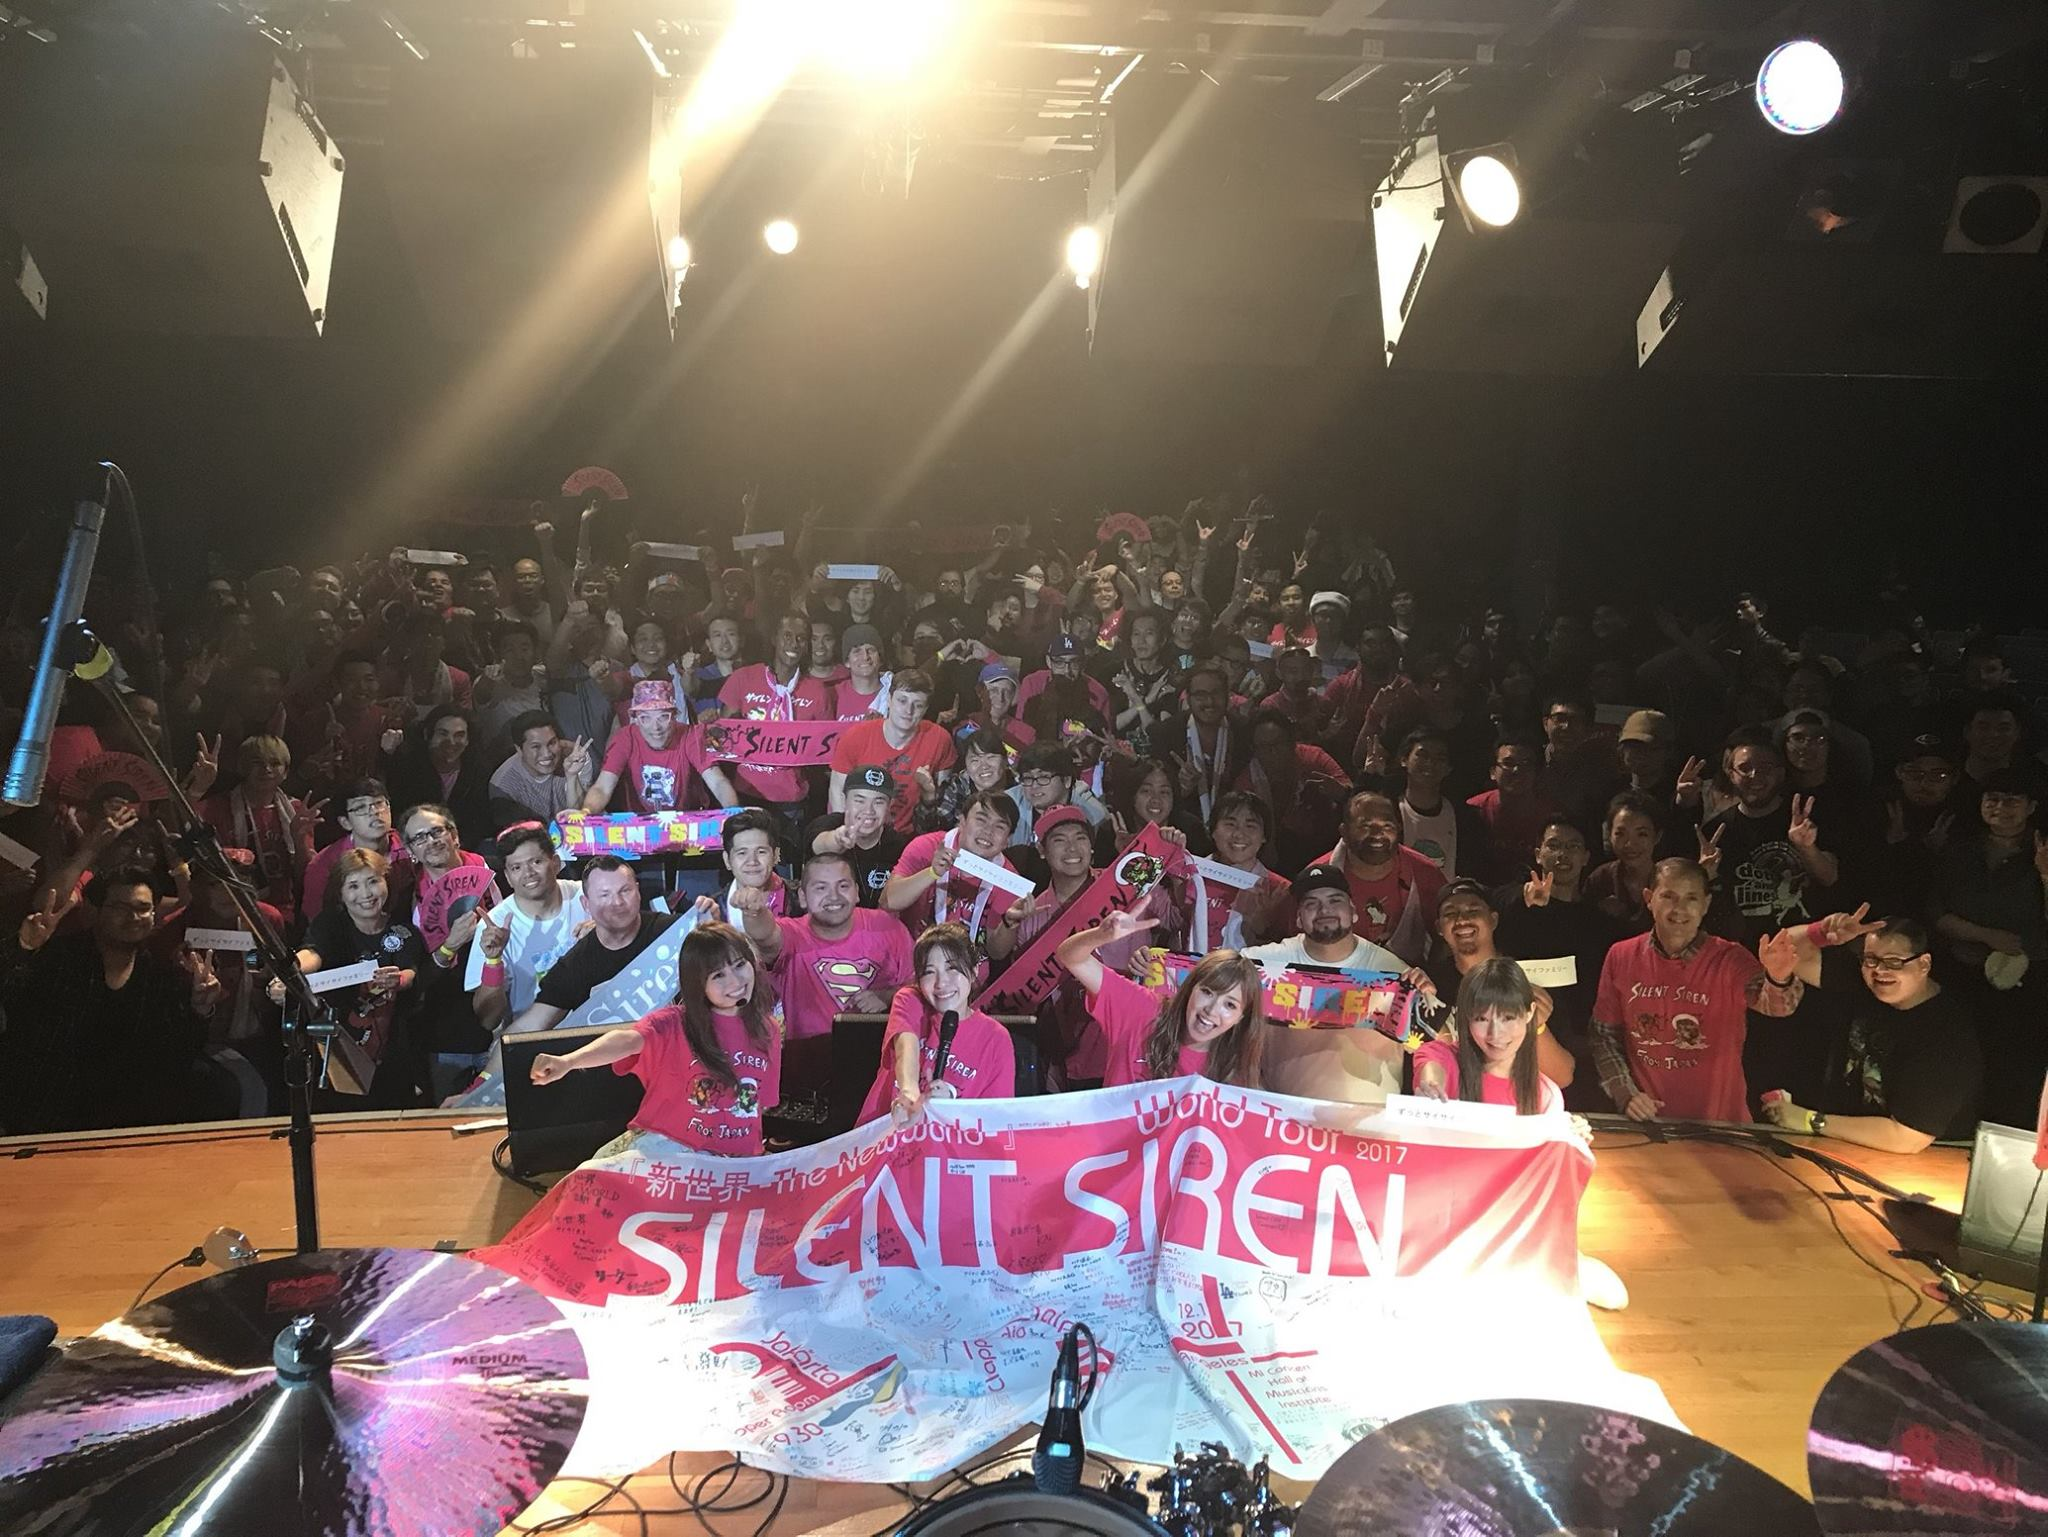 JRock247-SILENT-SIREN-2017-LA-Saisai-09